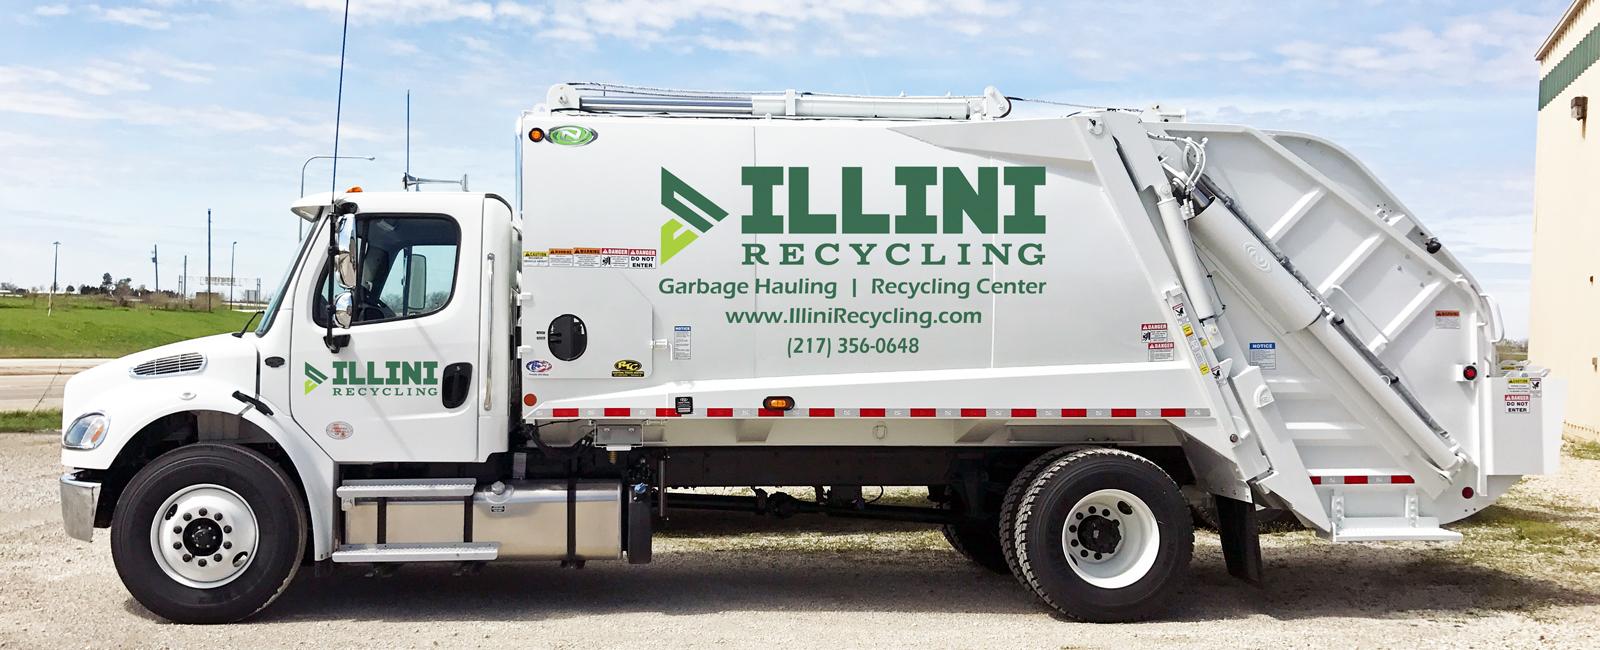 Illini Recycling